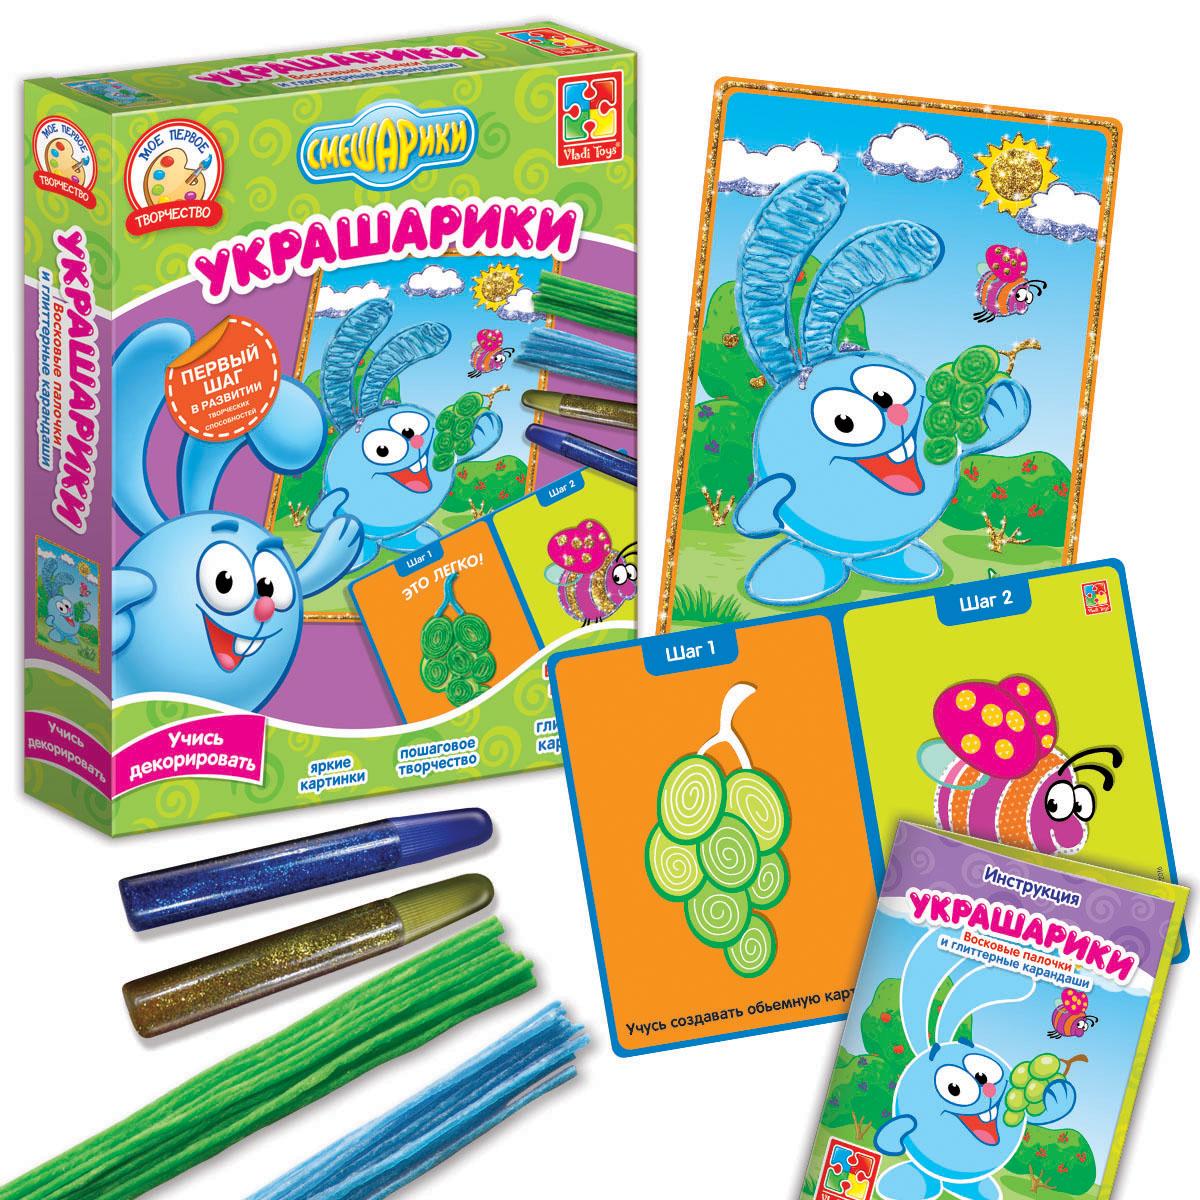 VLADI TOYS Набор для творчества Украшарики Крош